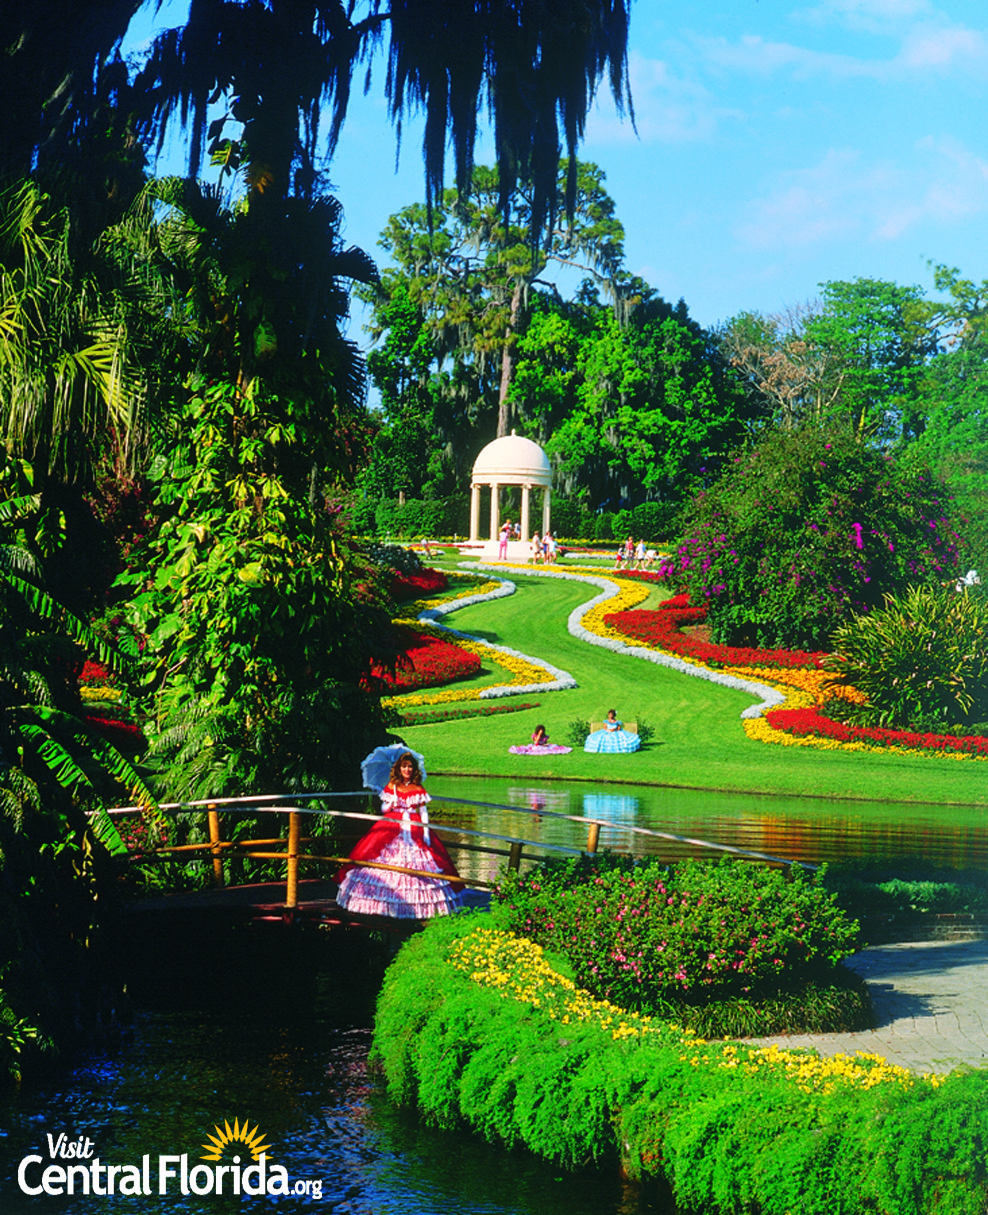 177e3a555f7b7974be0399351a0f587b - Cypress Gardens Adventure Park Winter Haven Fl